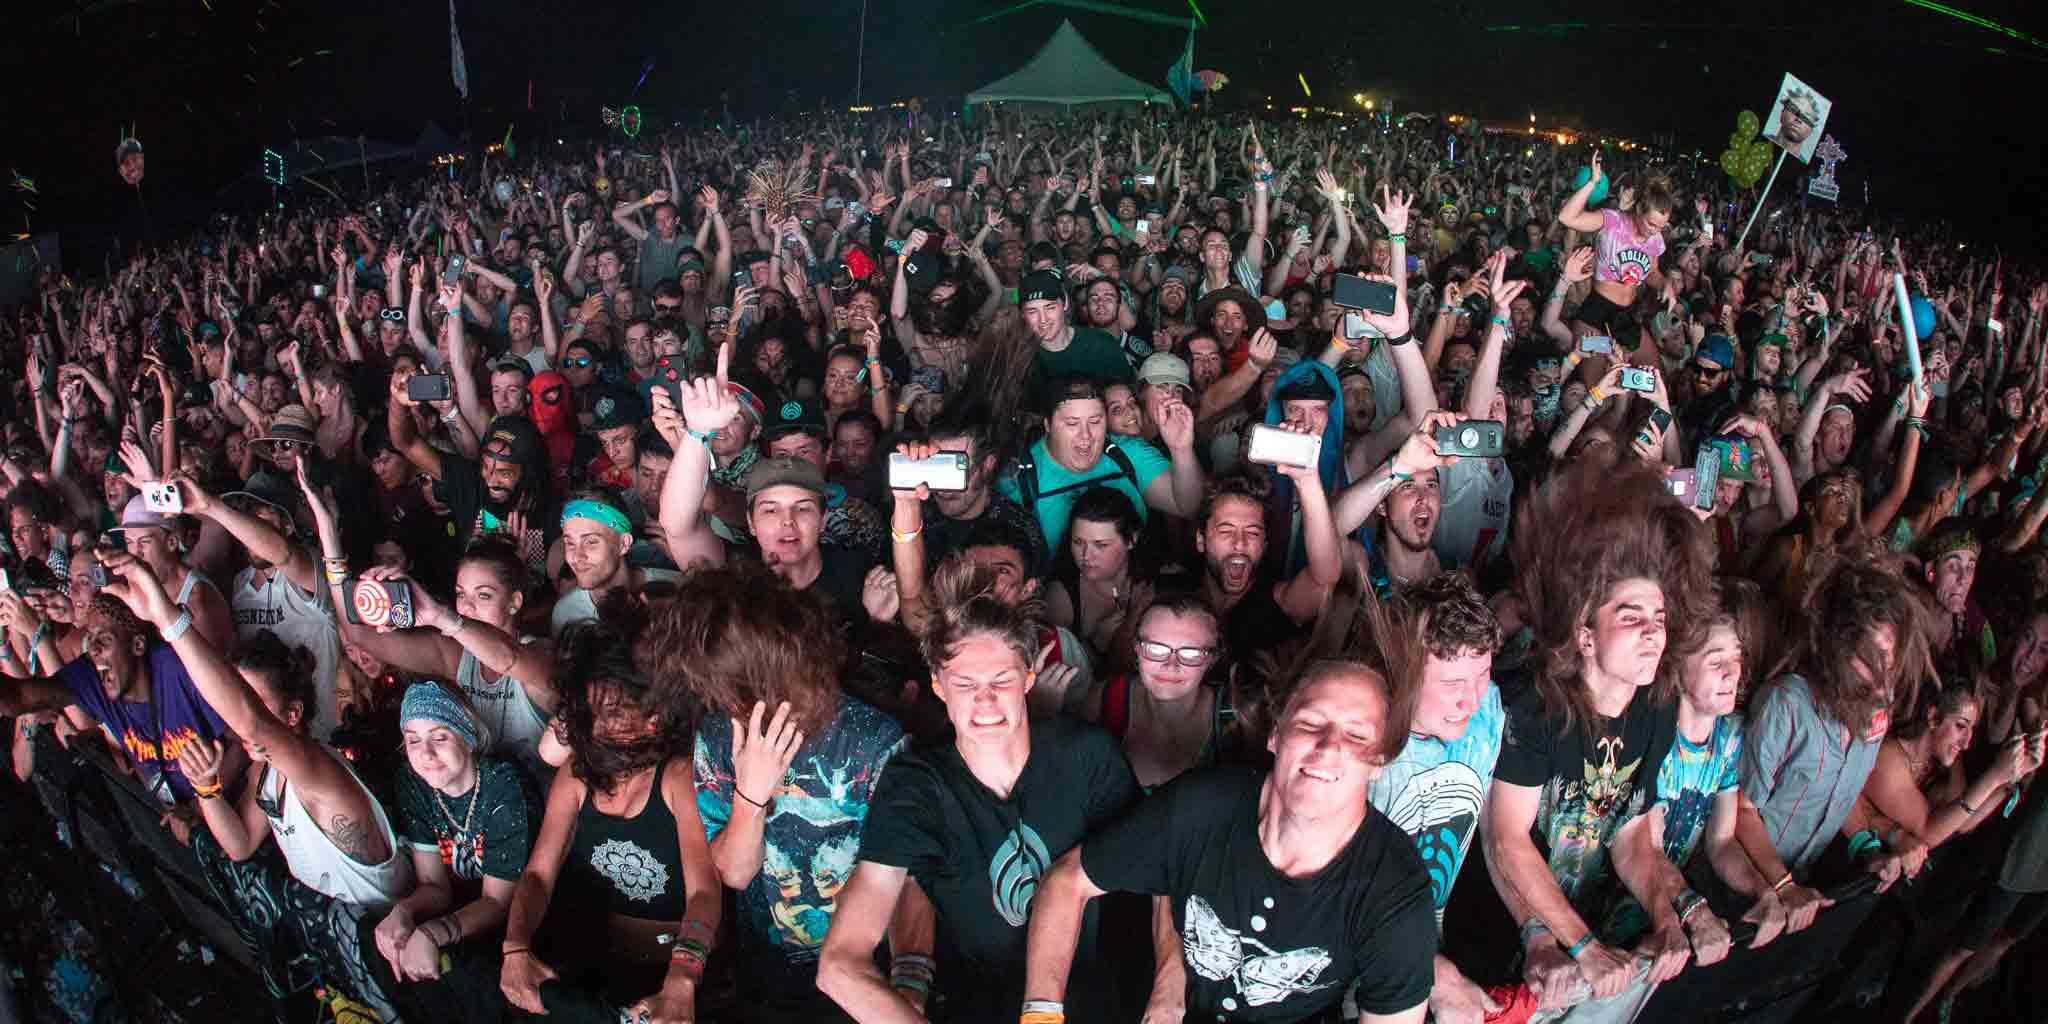 Music Festival Crowd of Fans